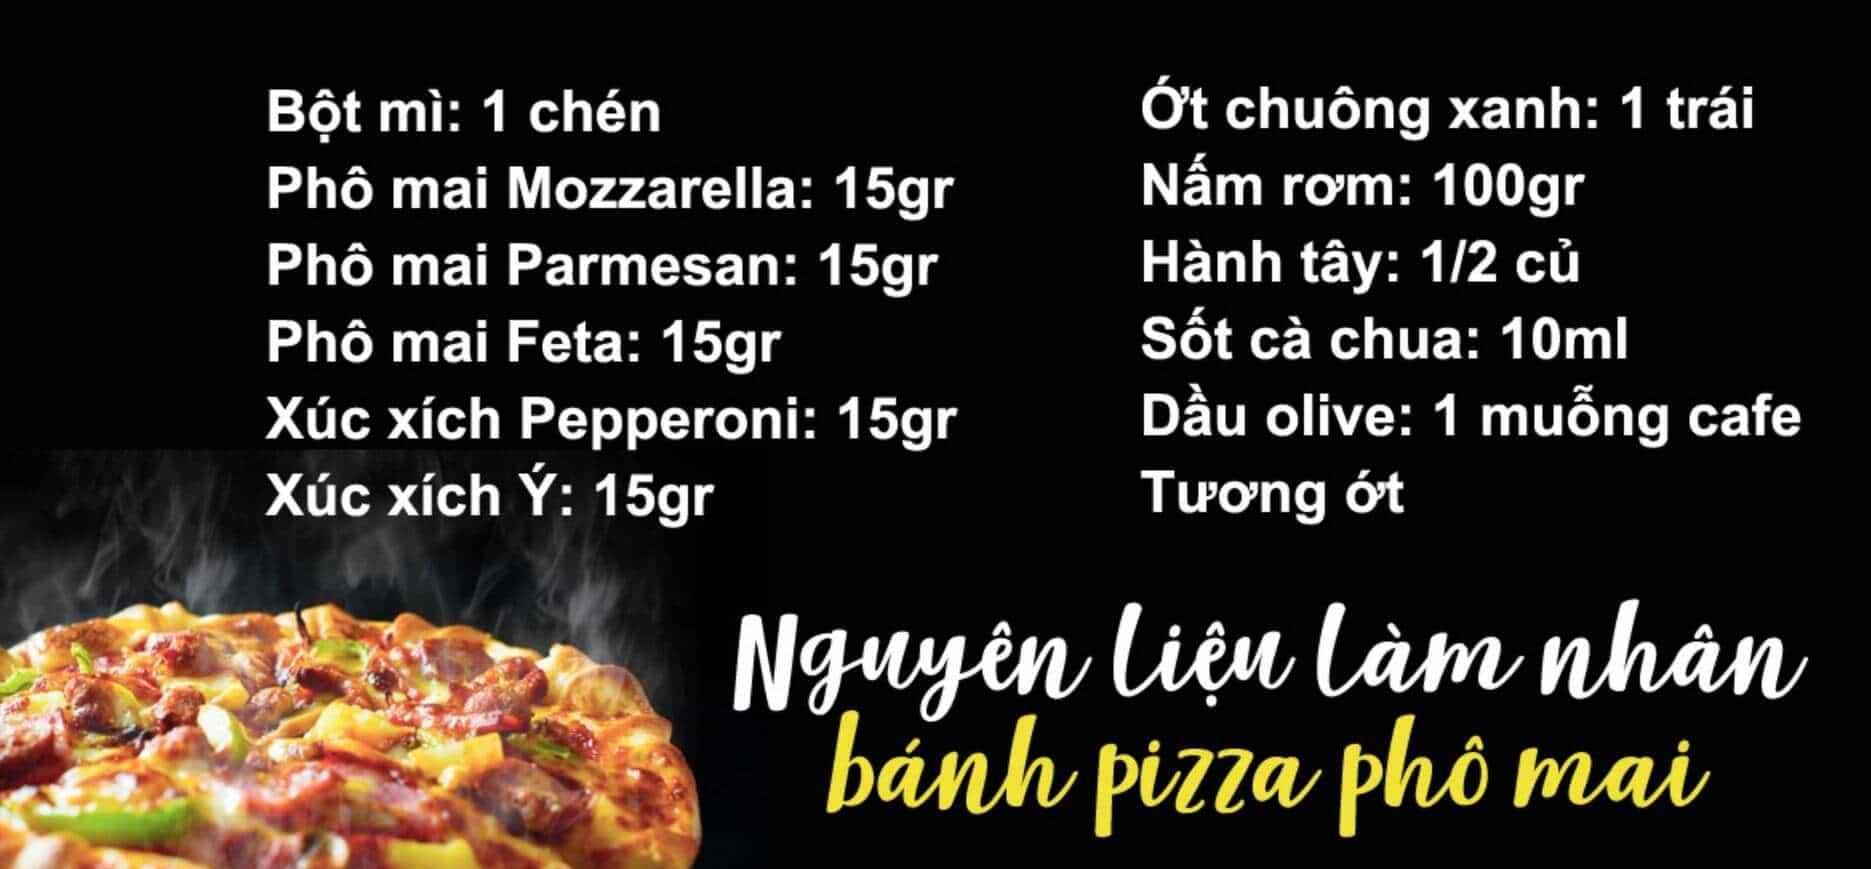 cach-lam-pizza-pho-mai-beo-ngay-ngon-ma-don-gian5